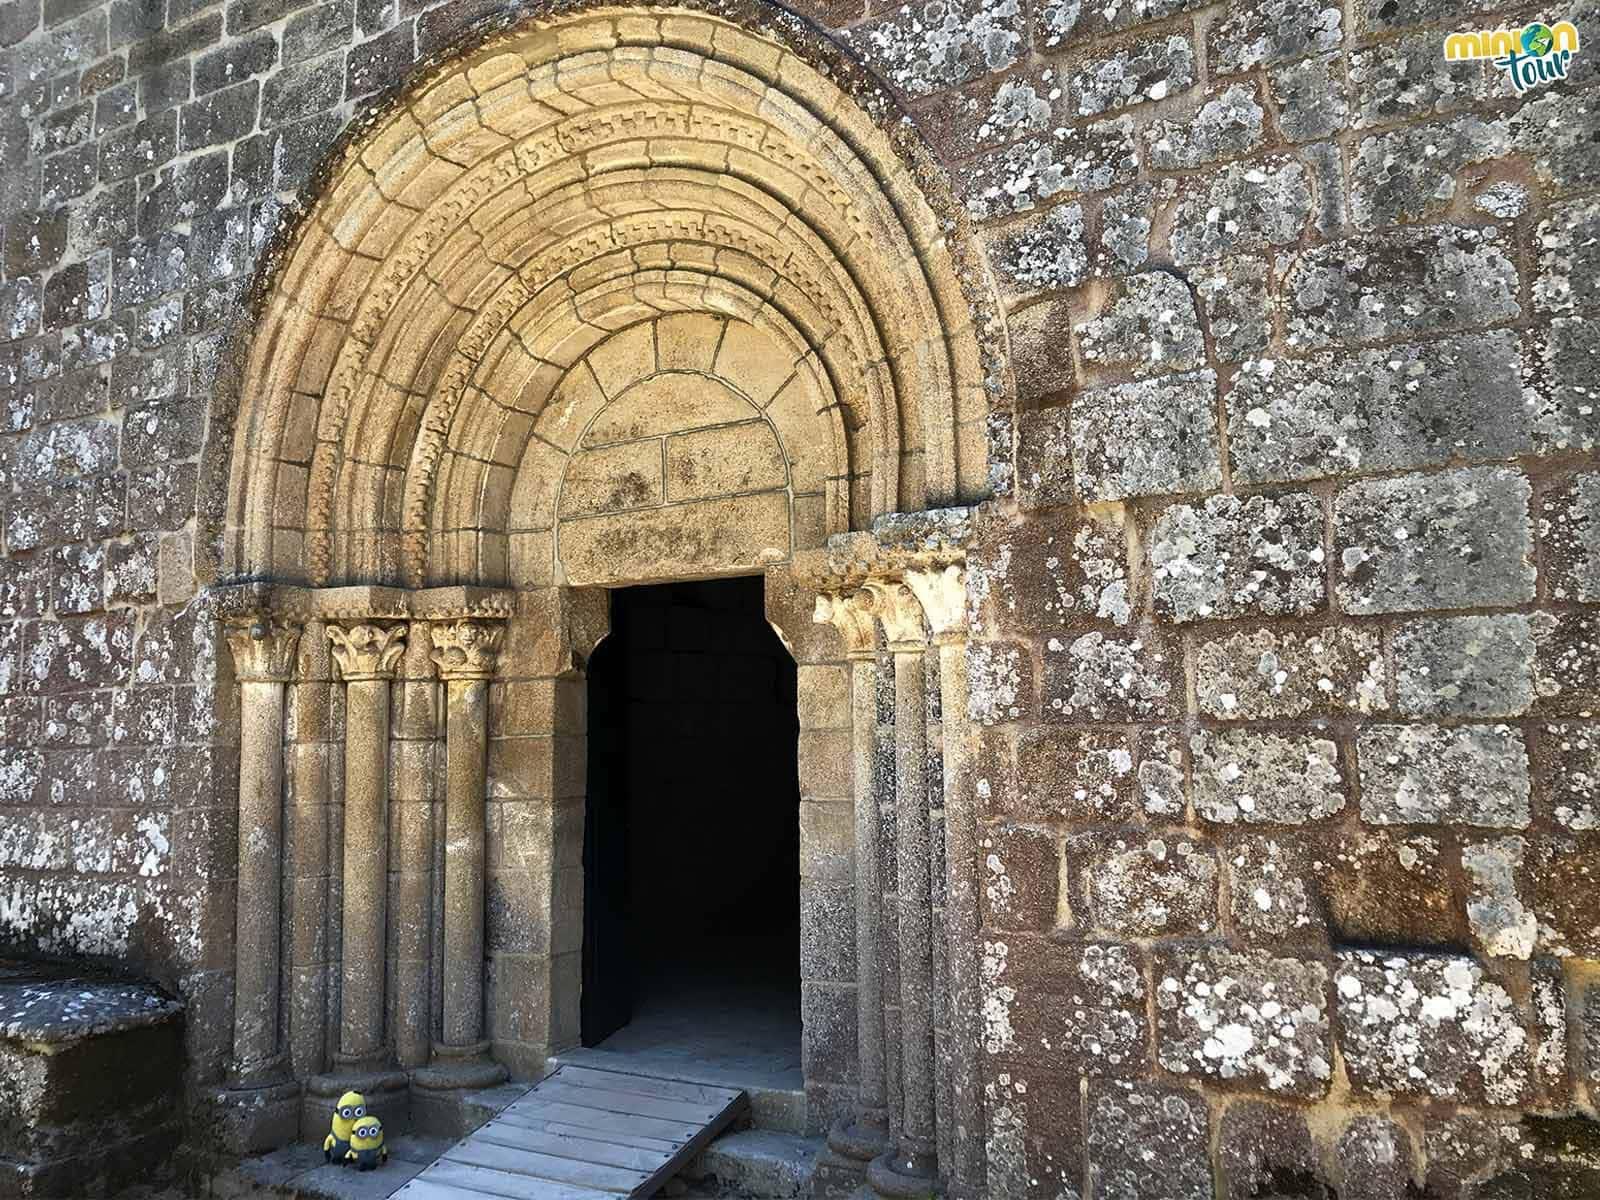 Interpretando la portada románica de la Iglesia del Monasterio de Santa Cristina de Ribas de Sil